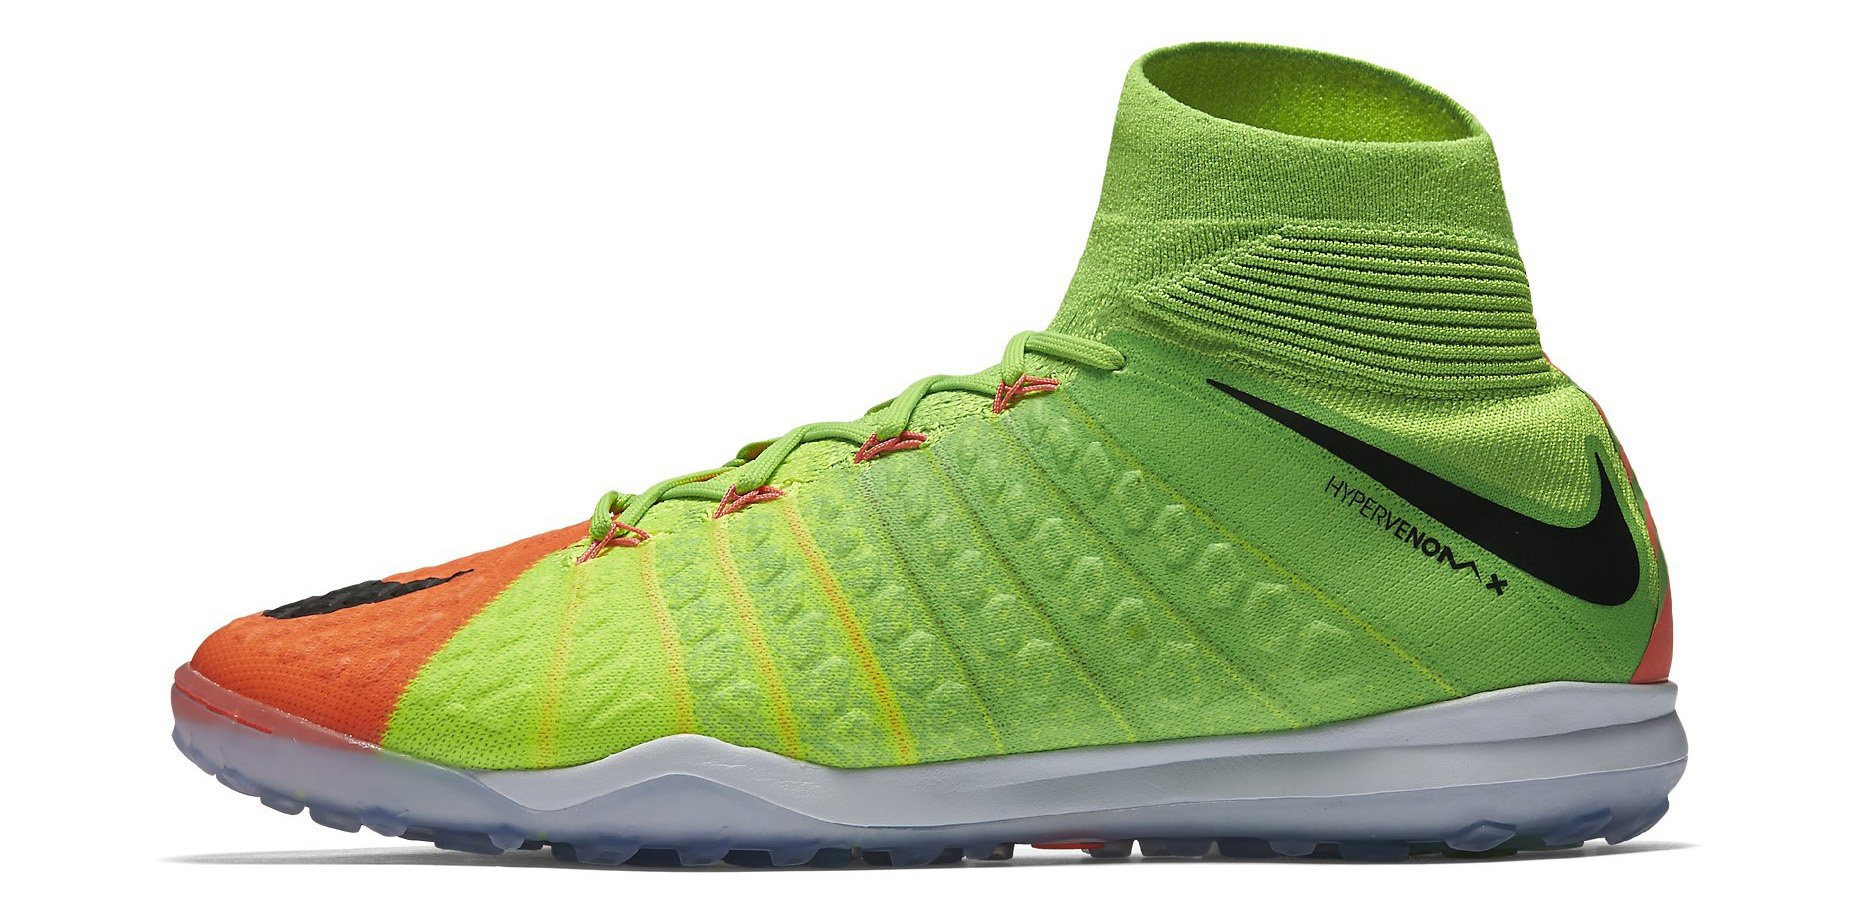 Nike HypervenomX Proximo II DF TF Football shoes Nike HYPERVENOMX PROXIMO II DF TF - Top4Football.com